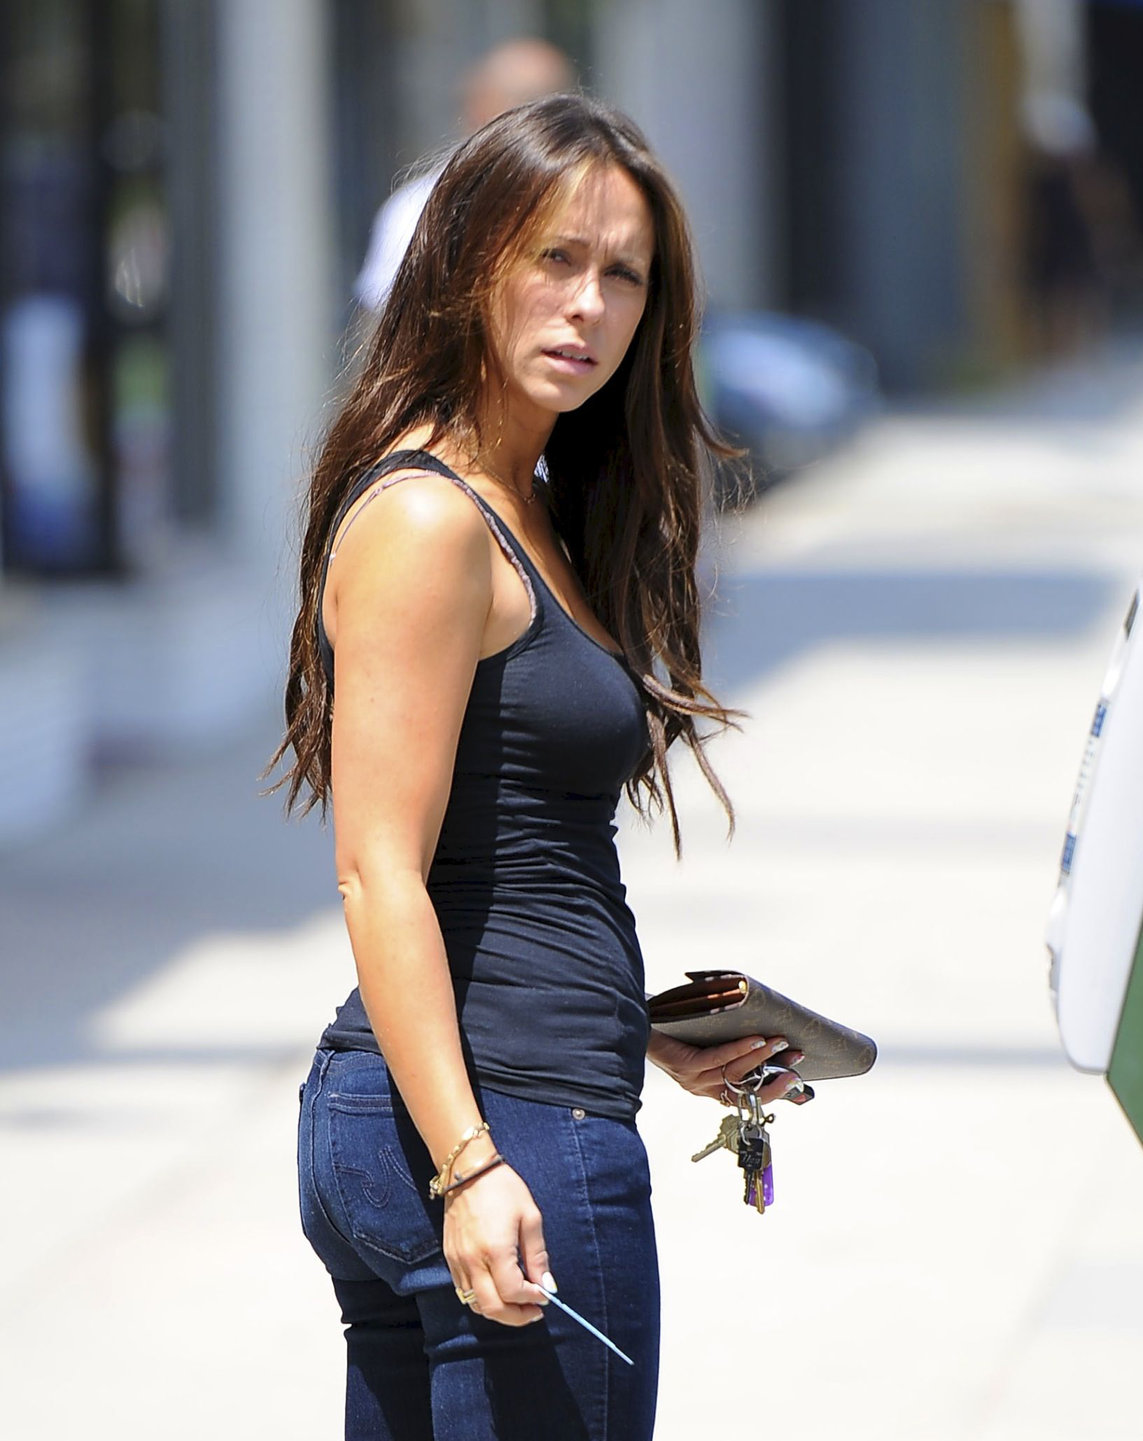 Jennifer Love Hewitt LA Candids June 3rd 2012